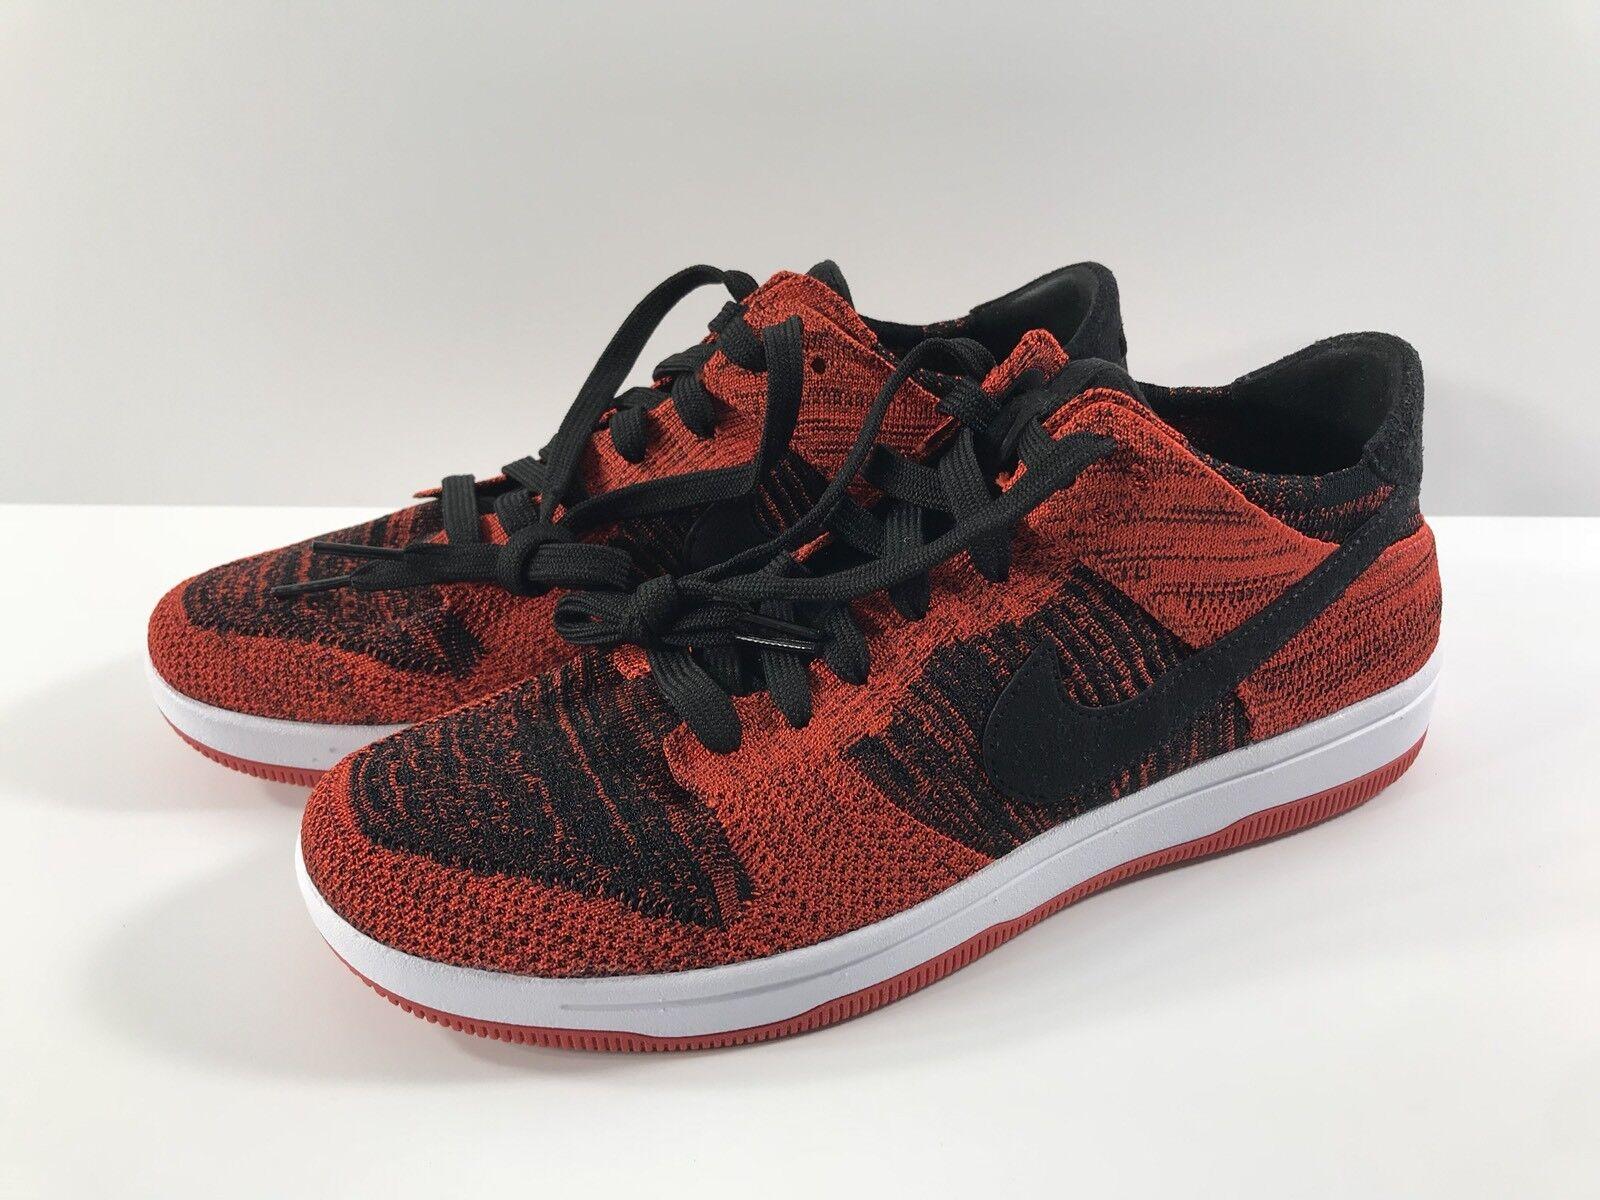 Nike 9,5 maschile flyknit caviglia alta schiacciare basket scarpa 9,5 Nike 917746 004 b53bfe